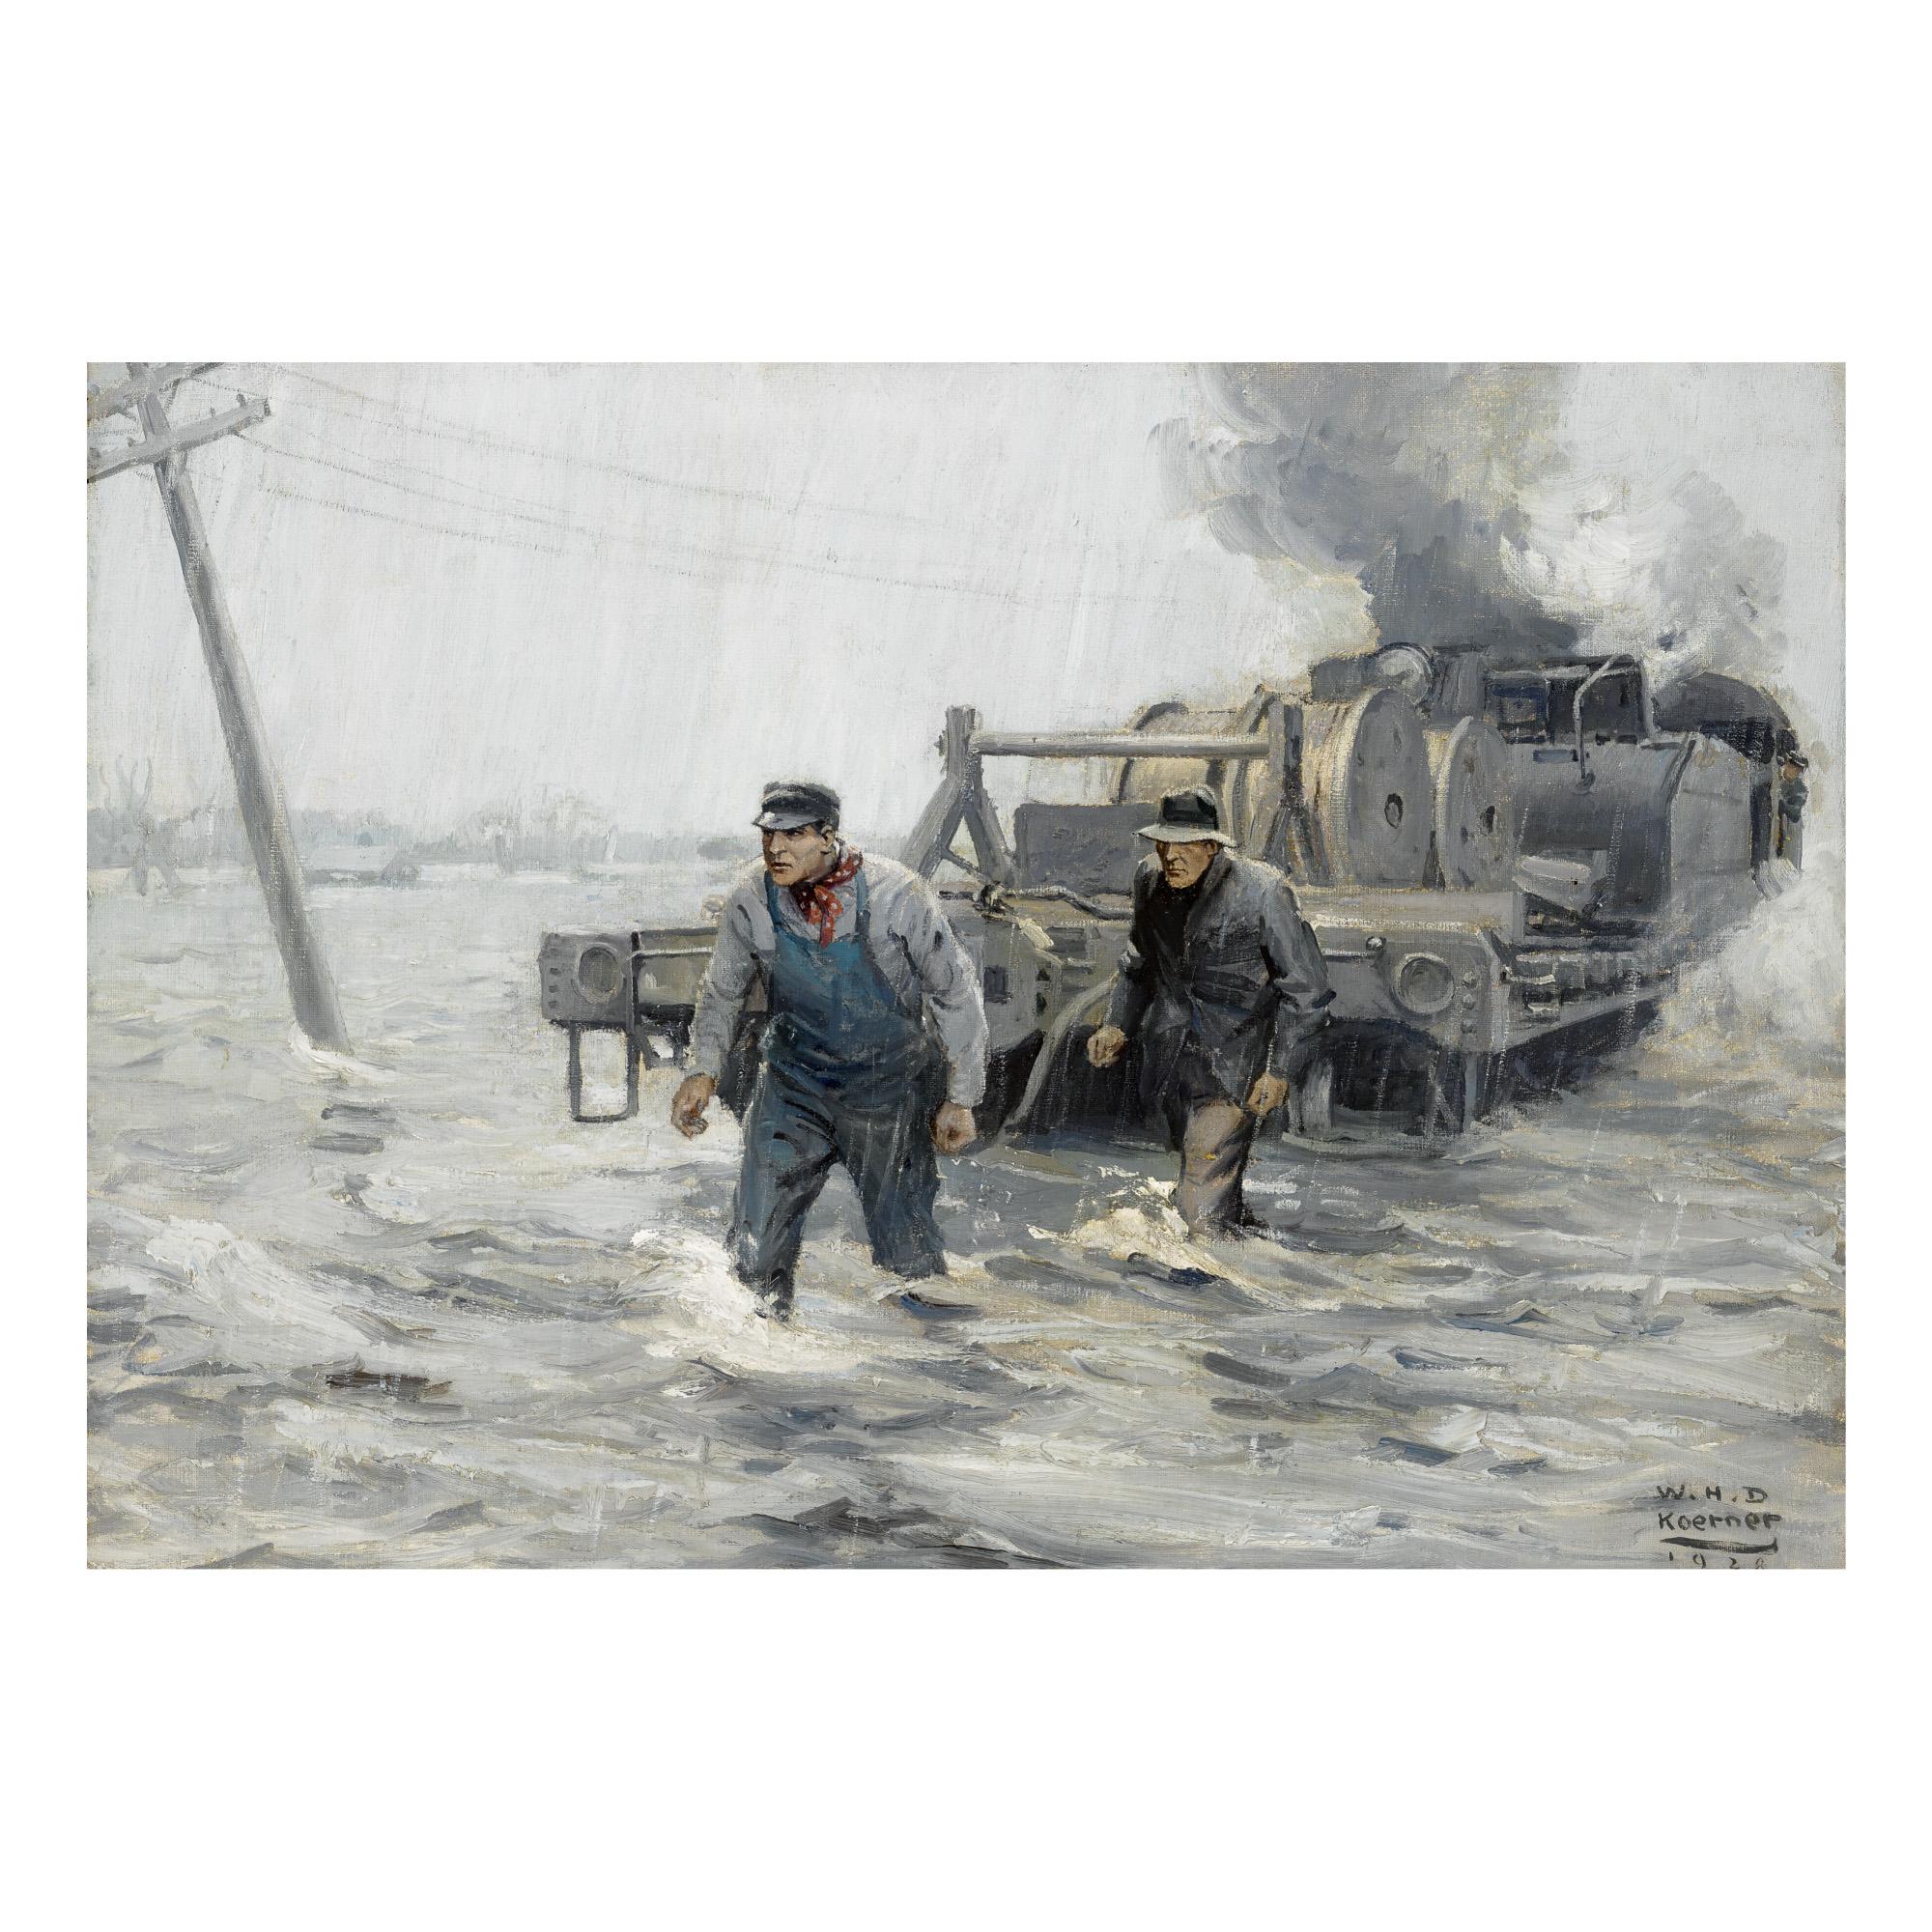 WILLIAM HENRY DETHLEF KOERNER | WIRES DOWN, TRACKS FLOODED (THE RESCUE)